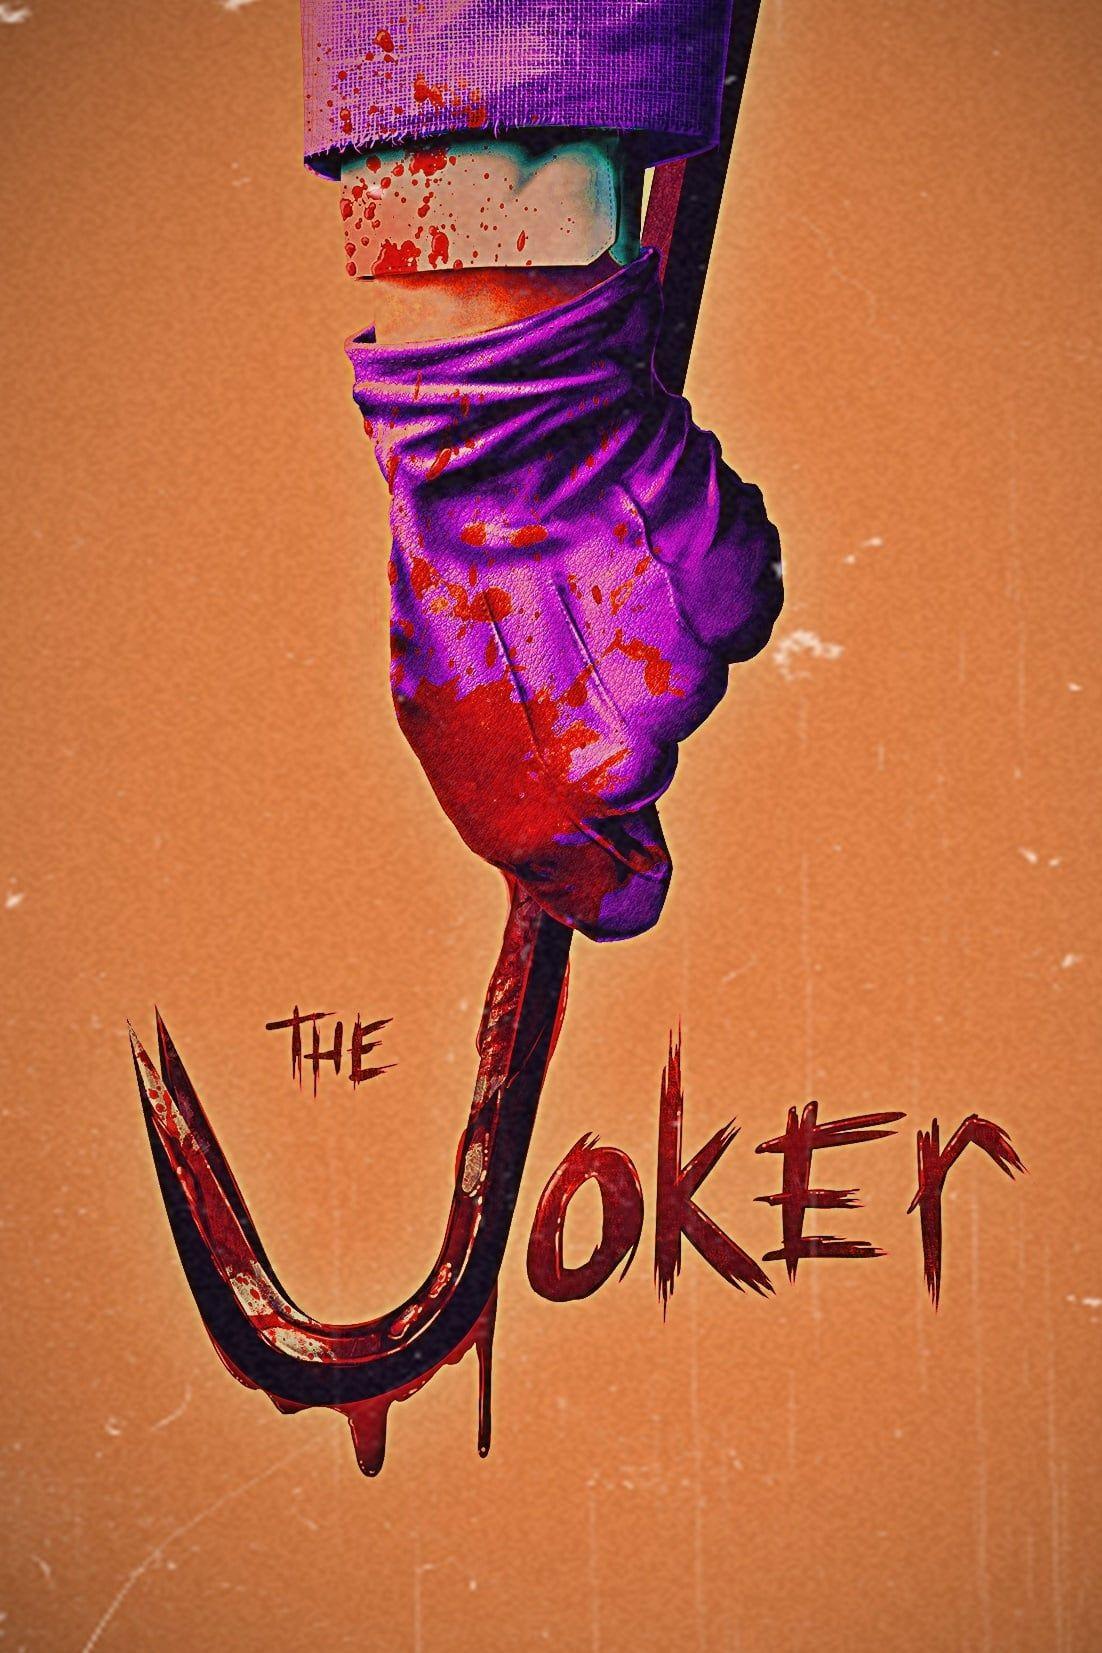 .Joker FULL MOVIE Streaming Online in HD720p Video